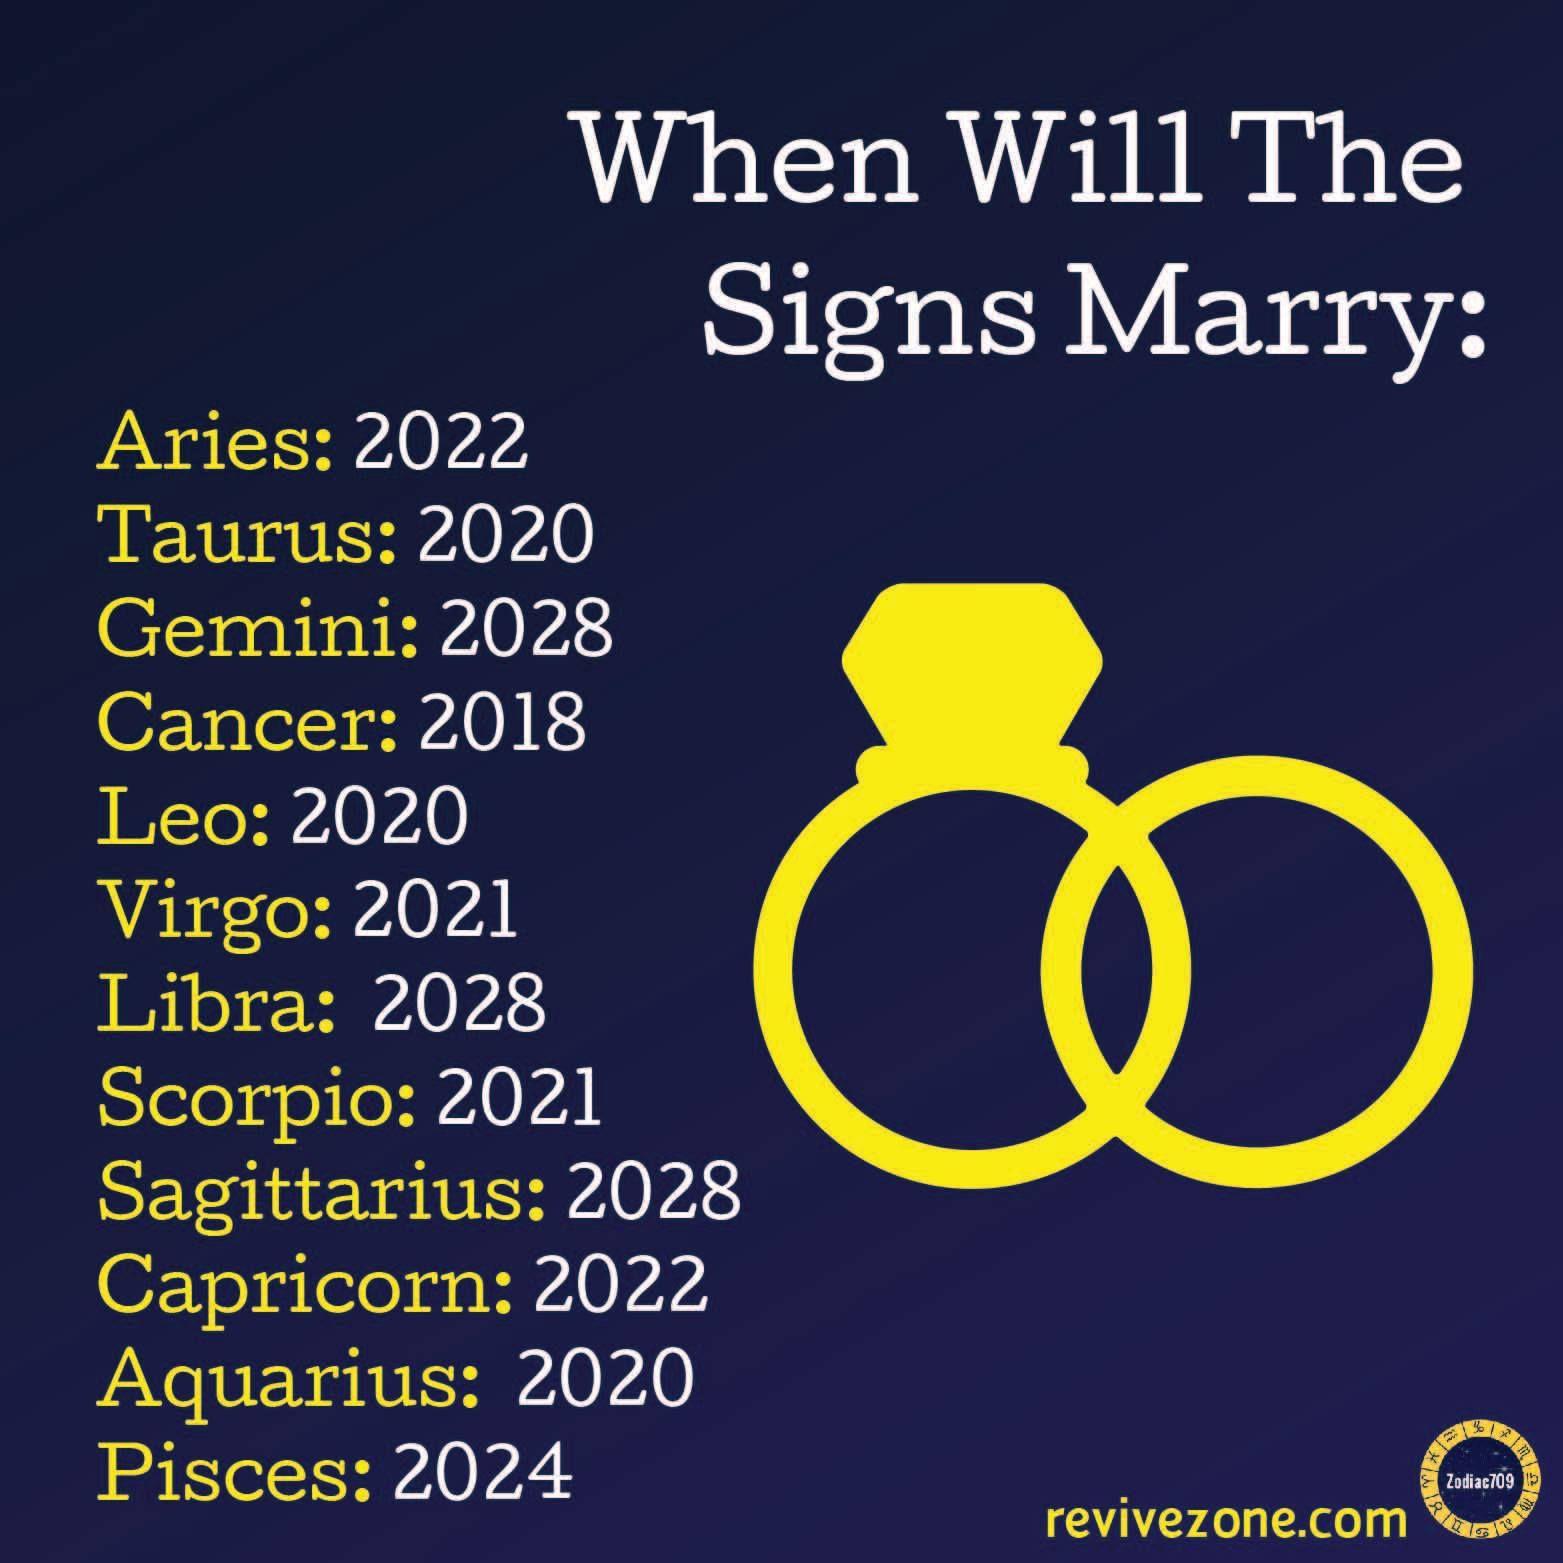 zodiac signs, aries, taurus, gemini, cancer, leo, virgo, libra